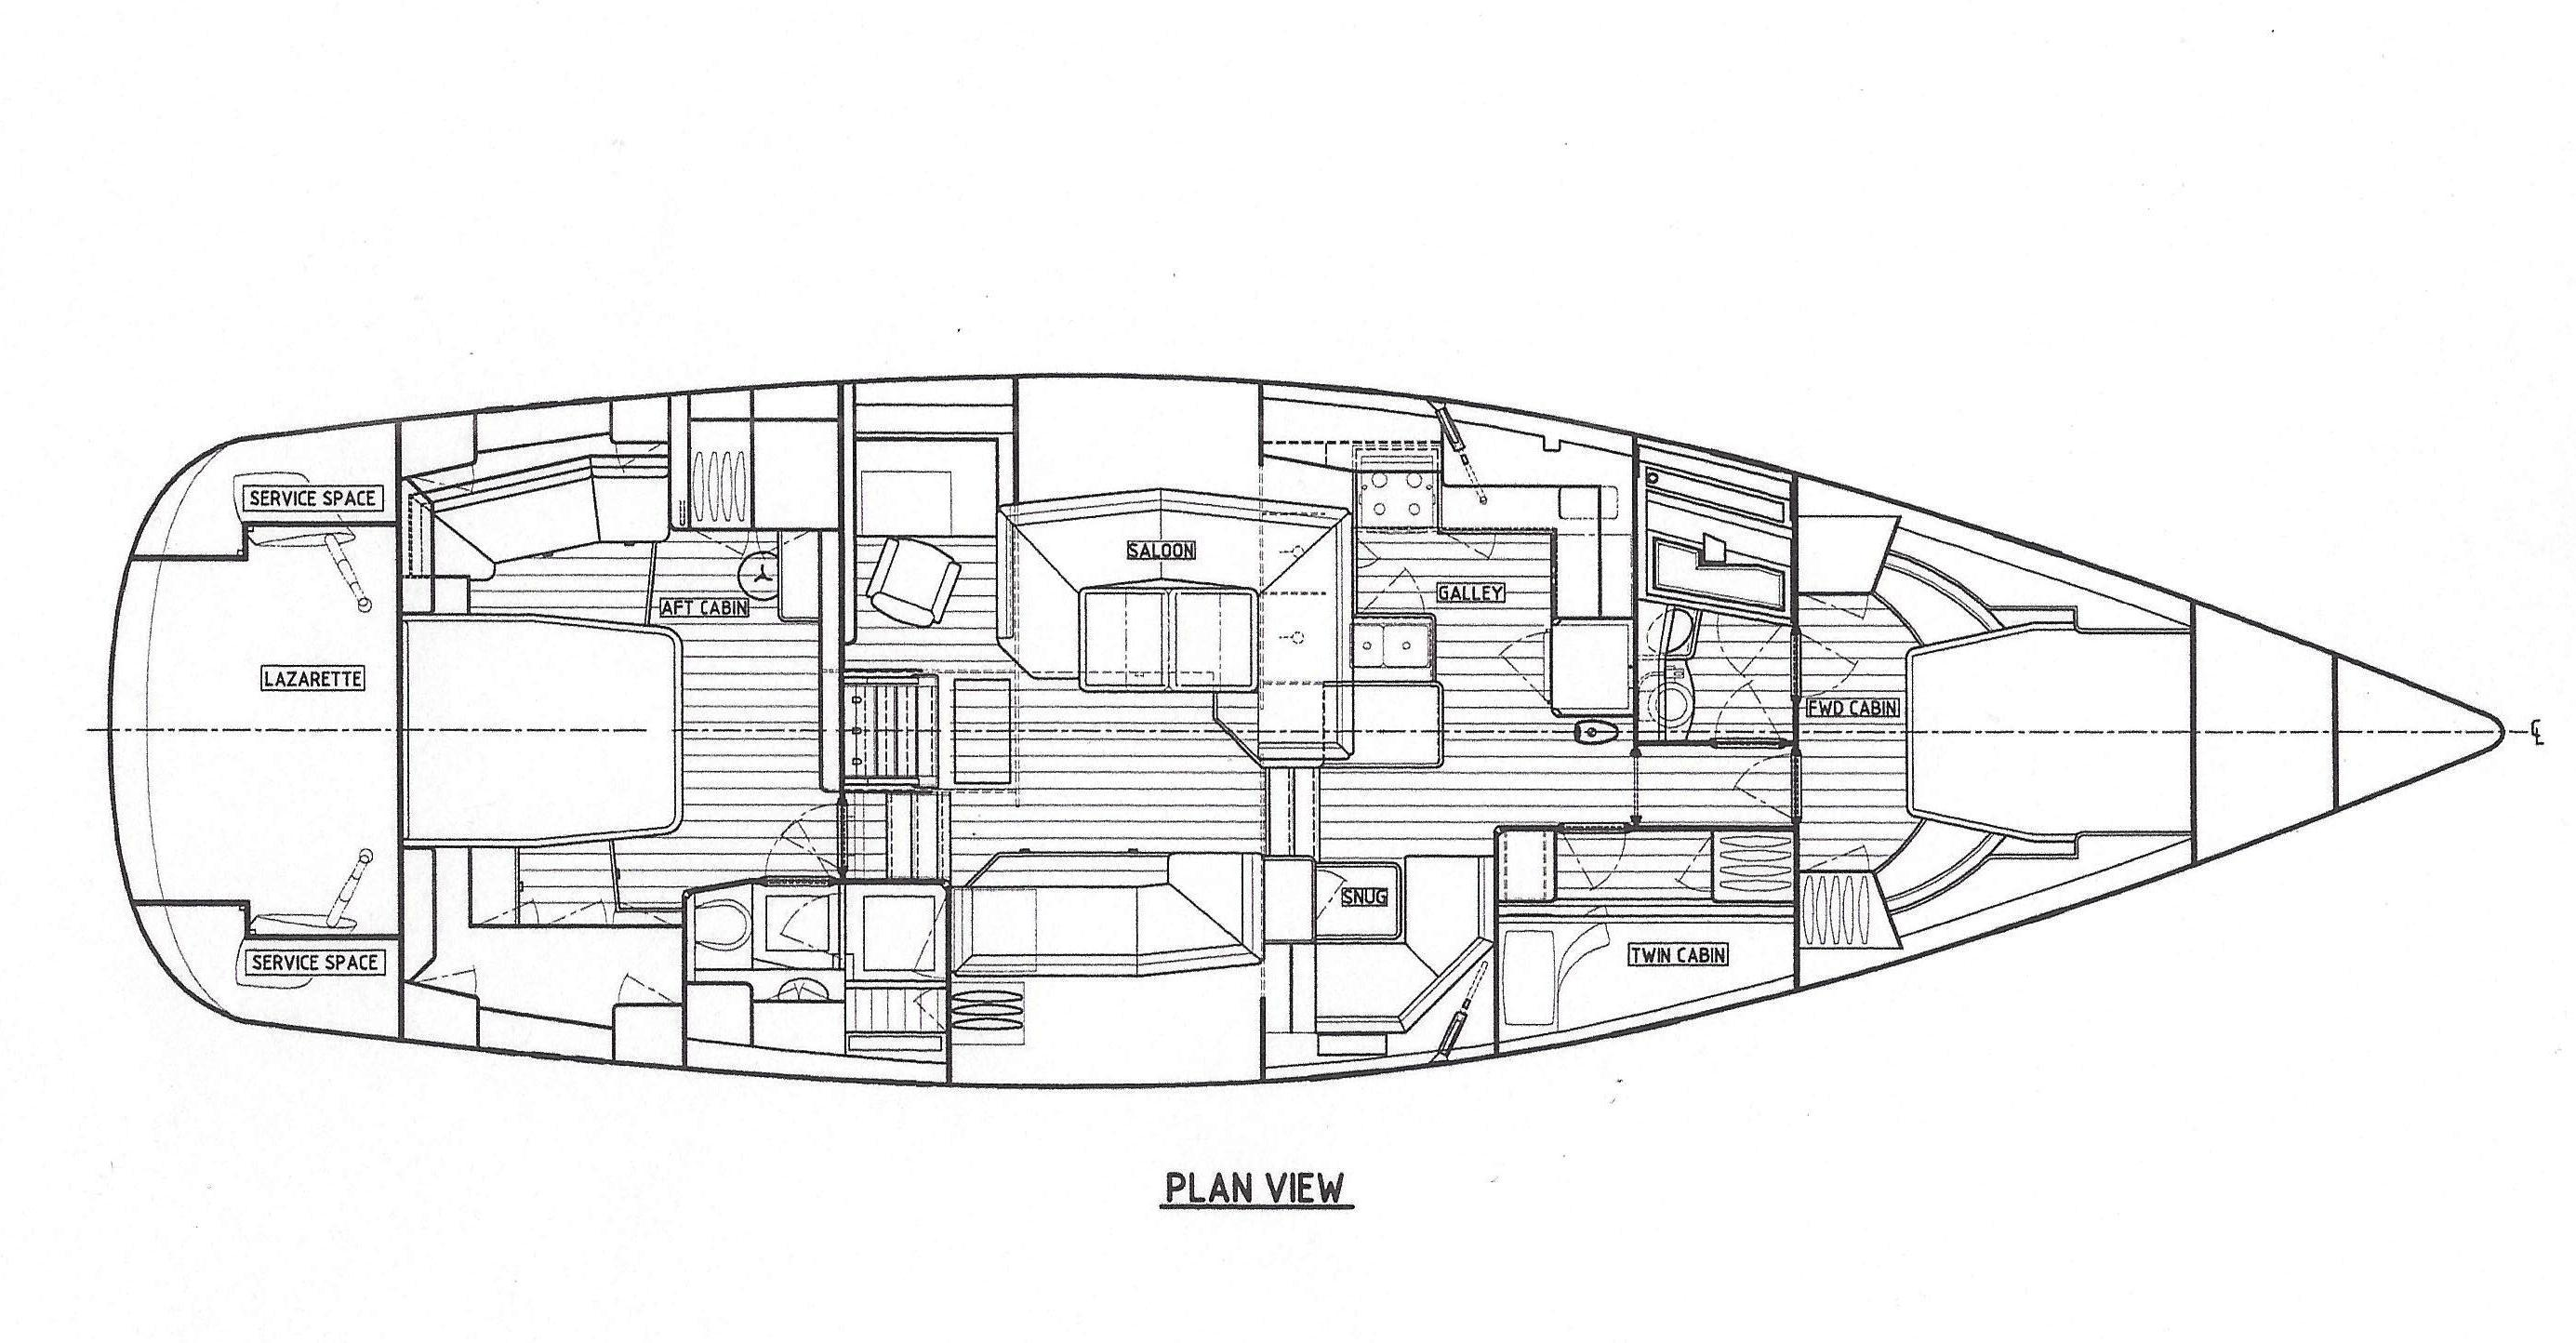 Southerly 57 standard layout